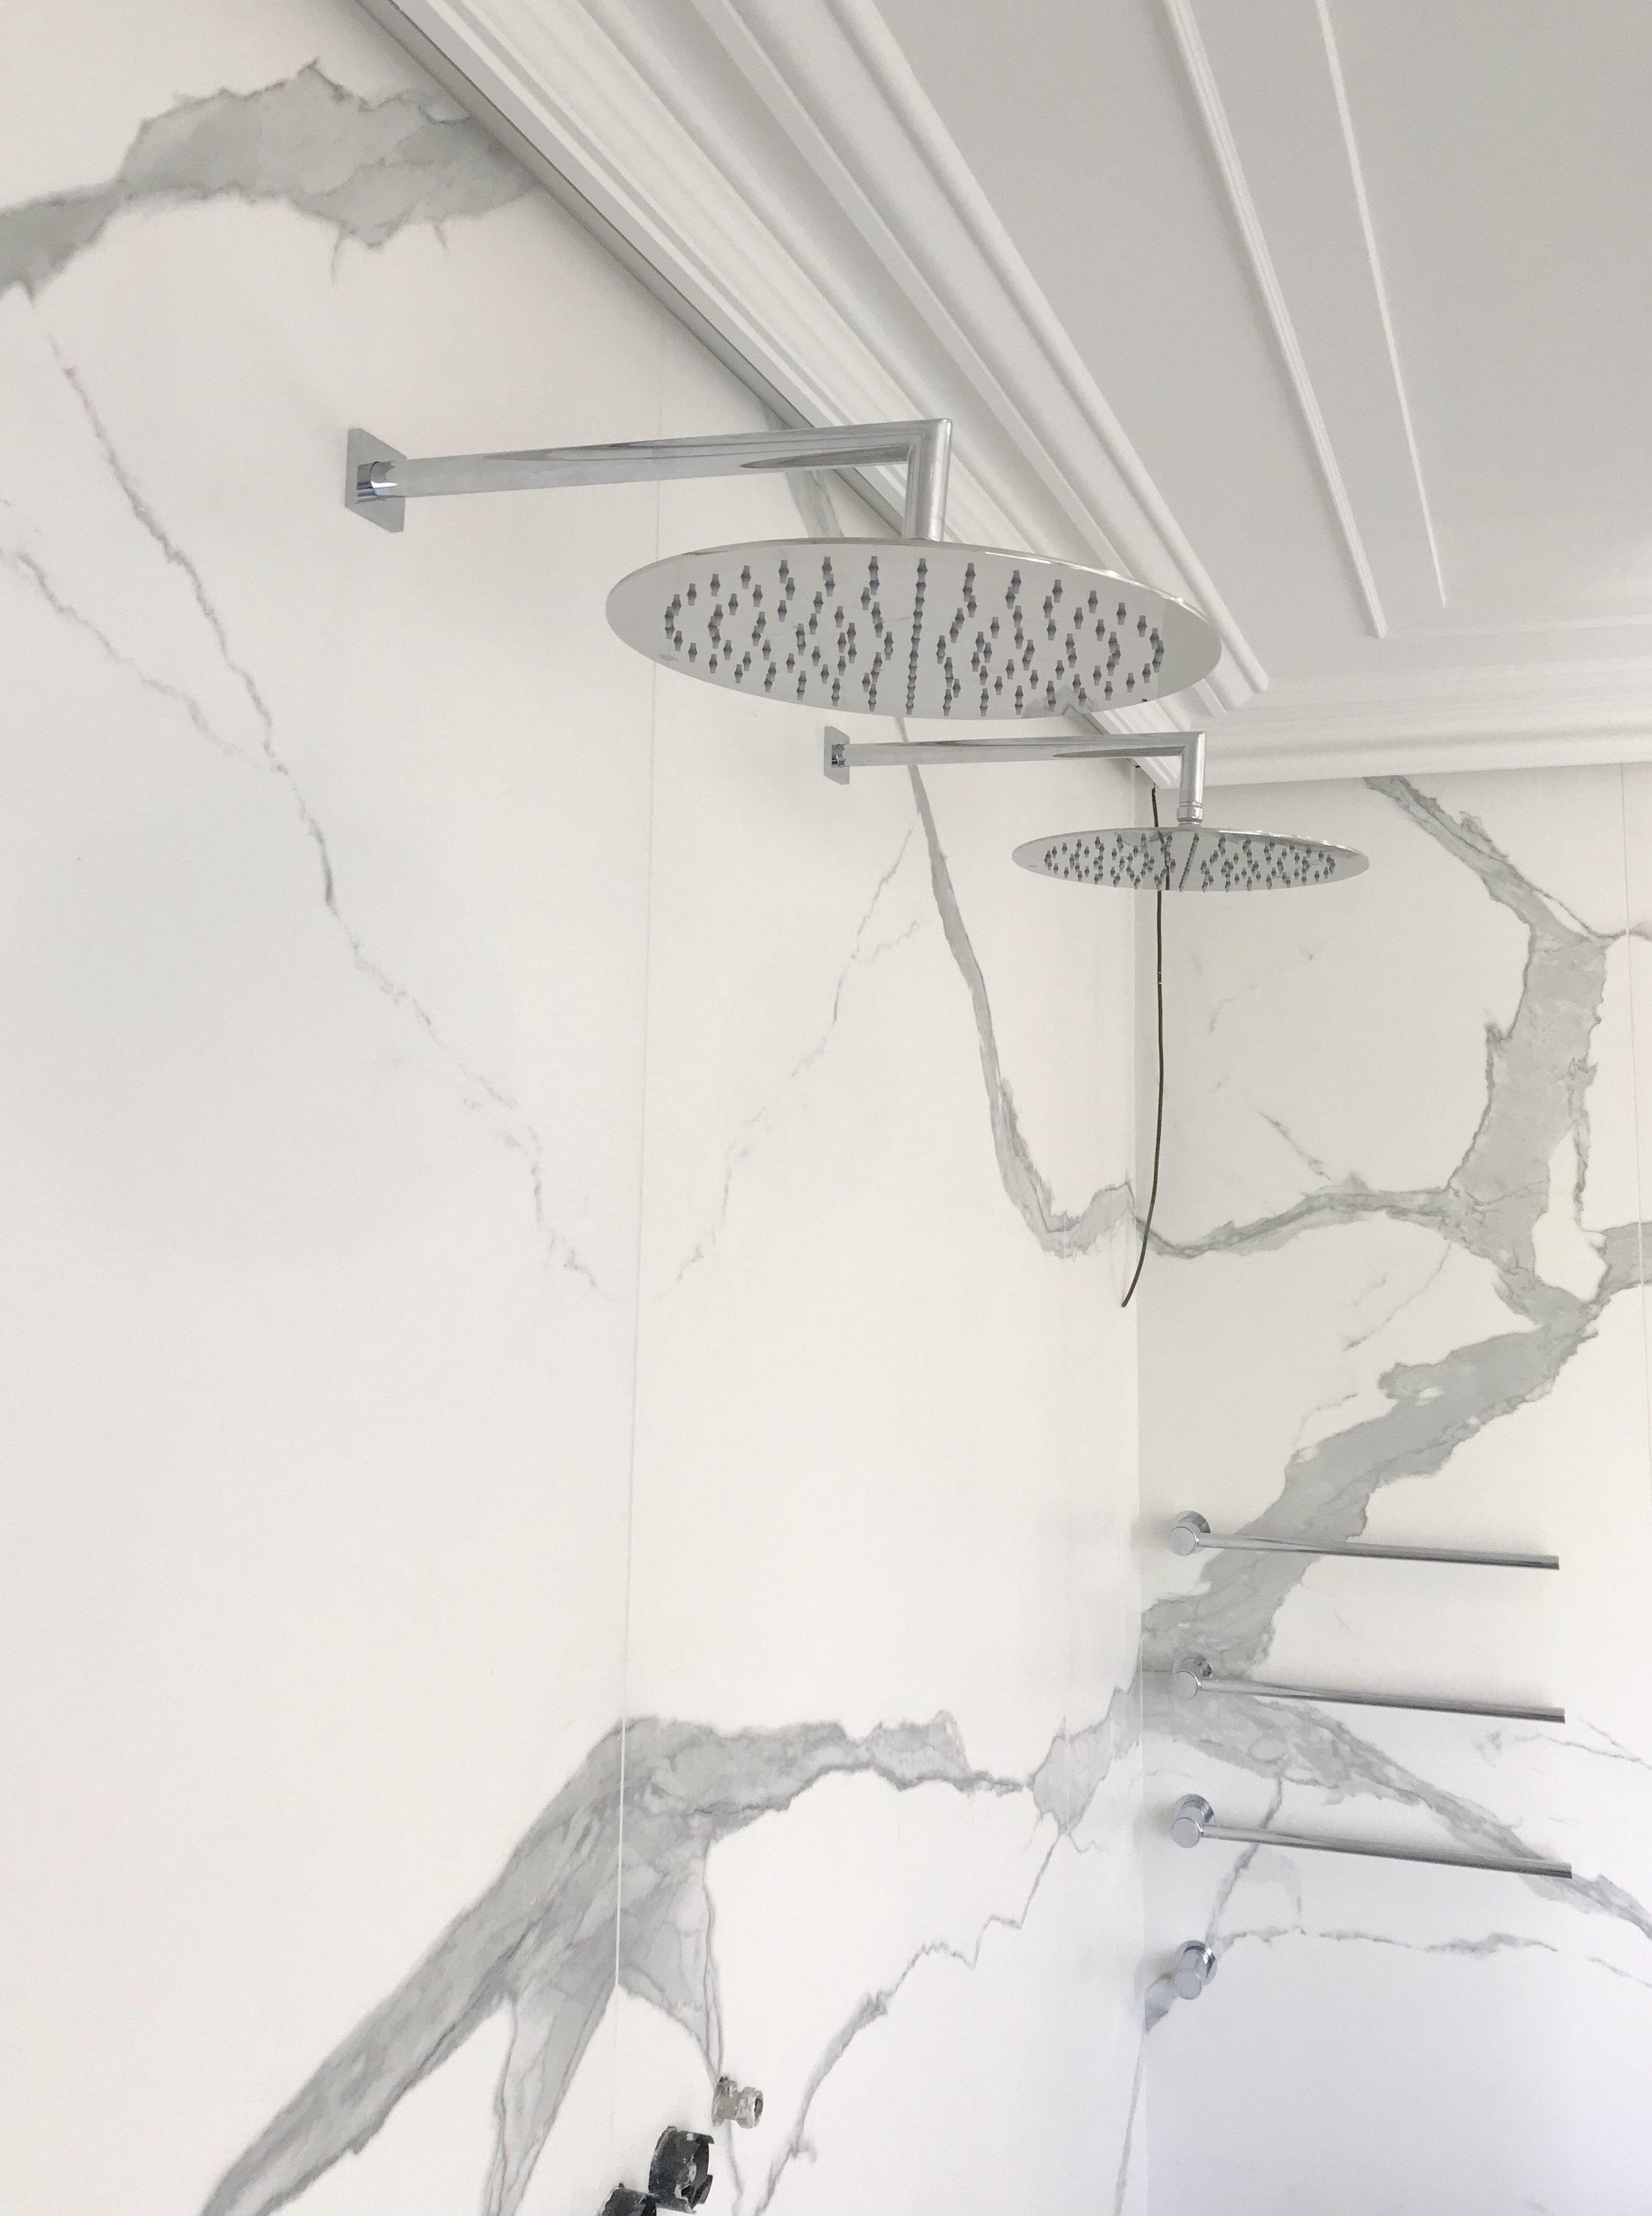 Tile featured: I Classici di Rex Statuario soft